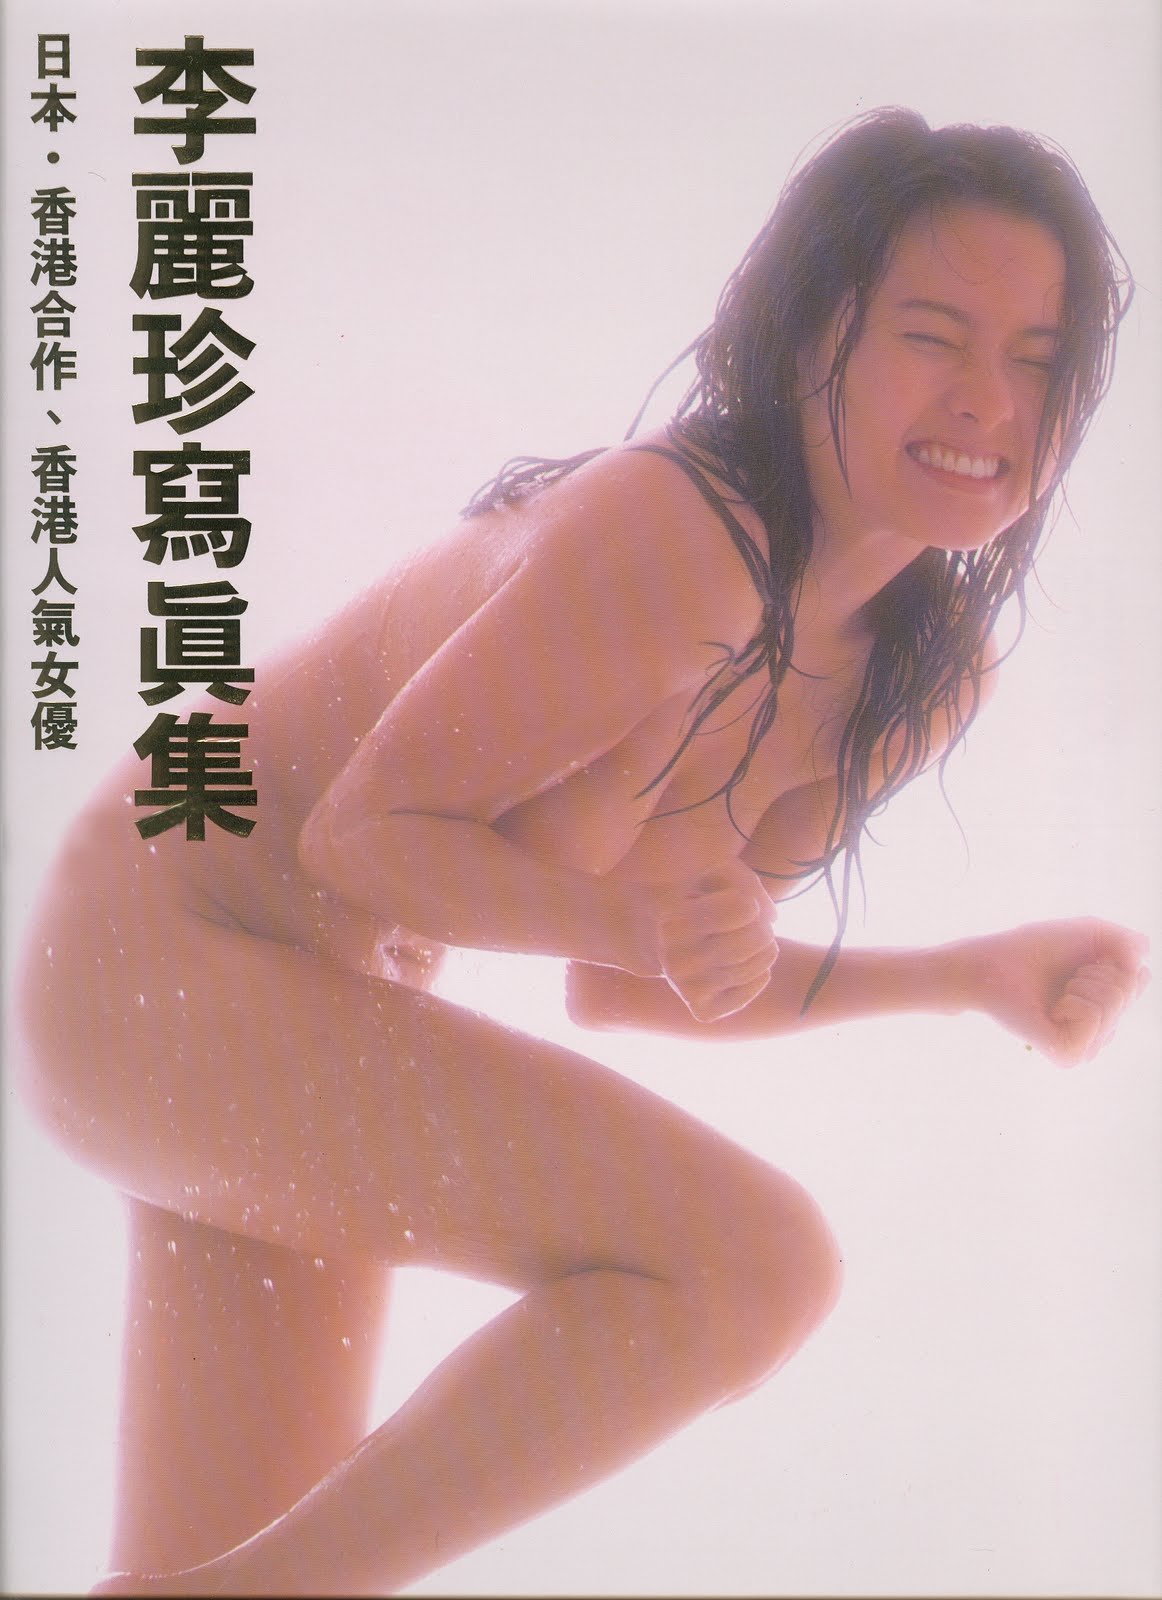 tumblr tiny naked pussy innie ass